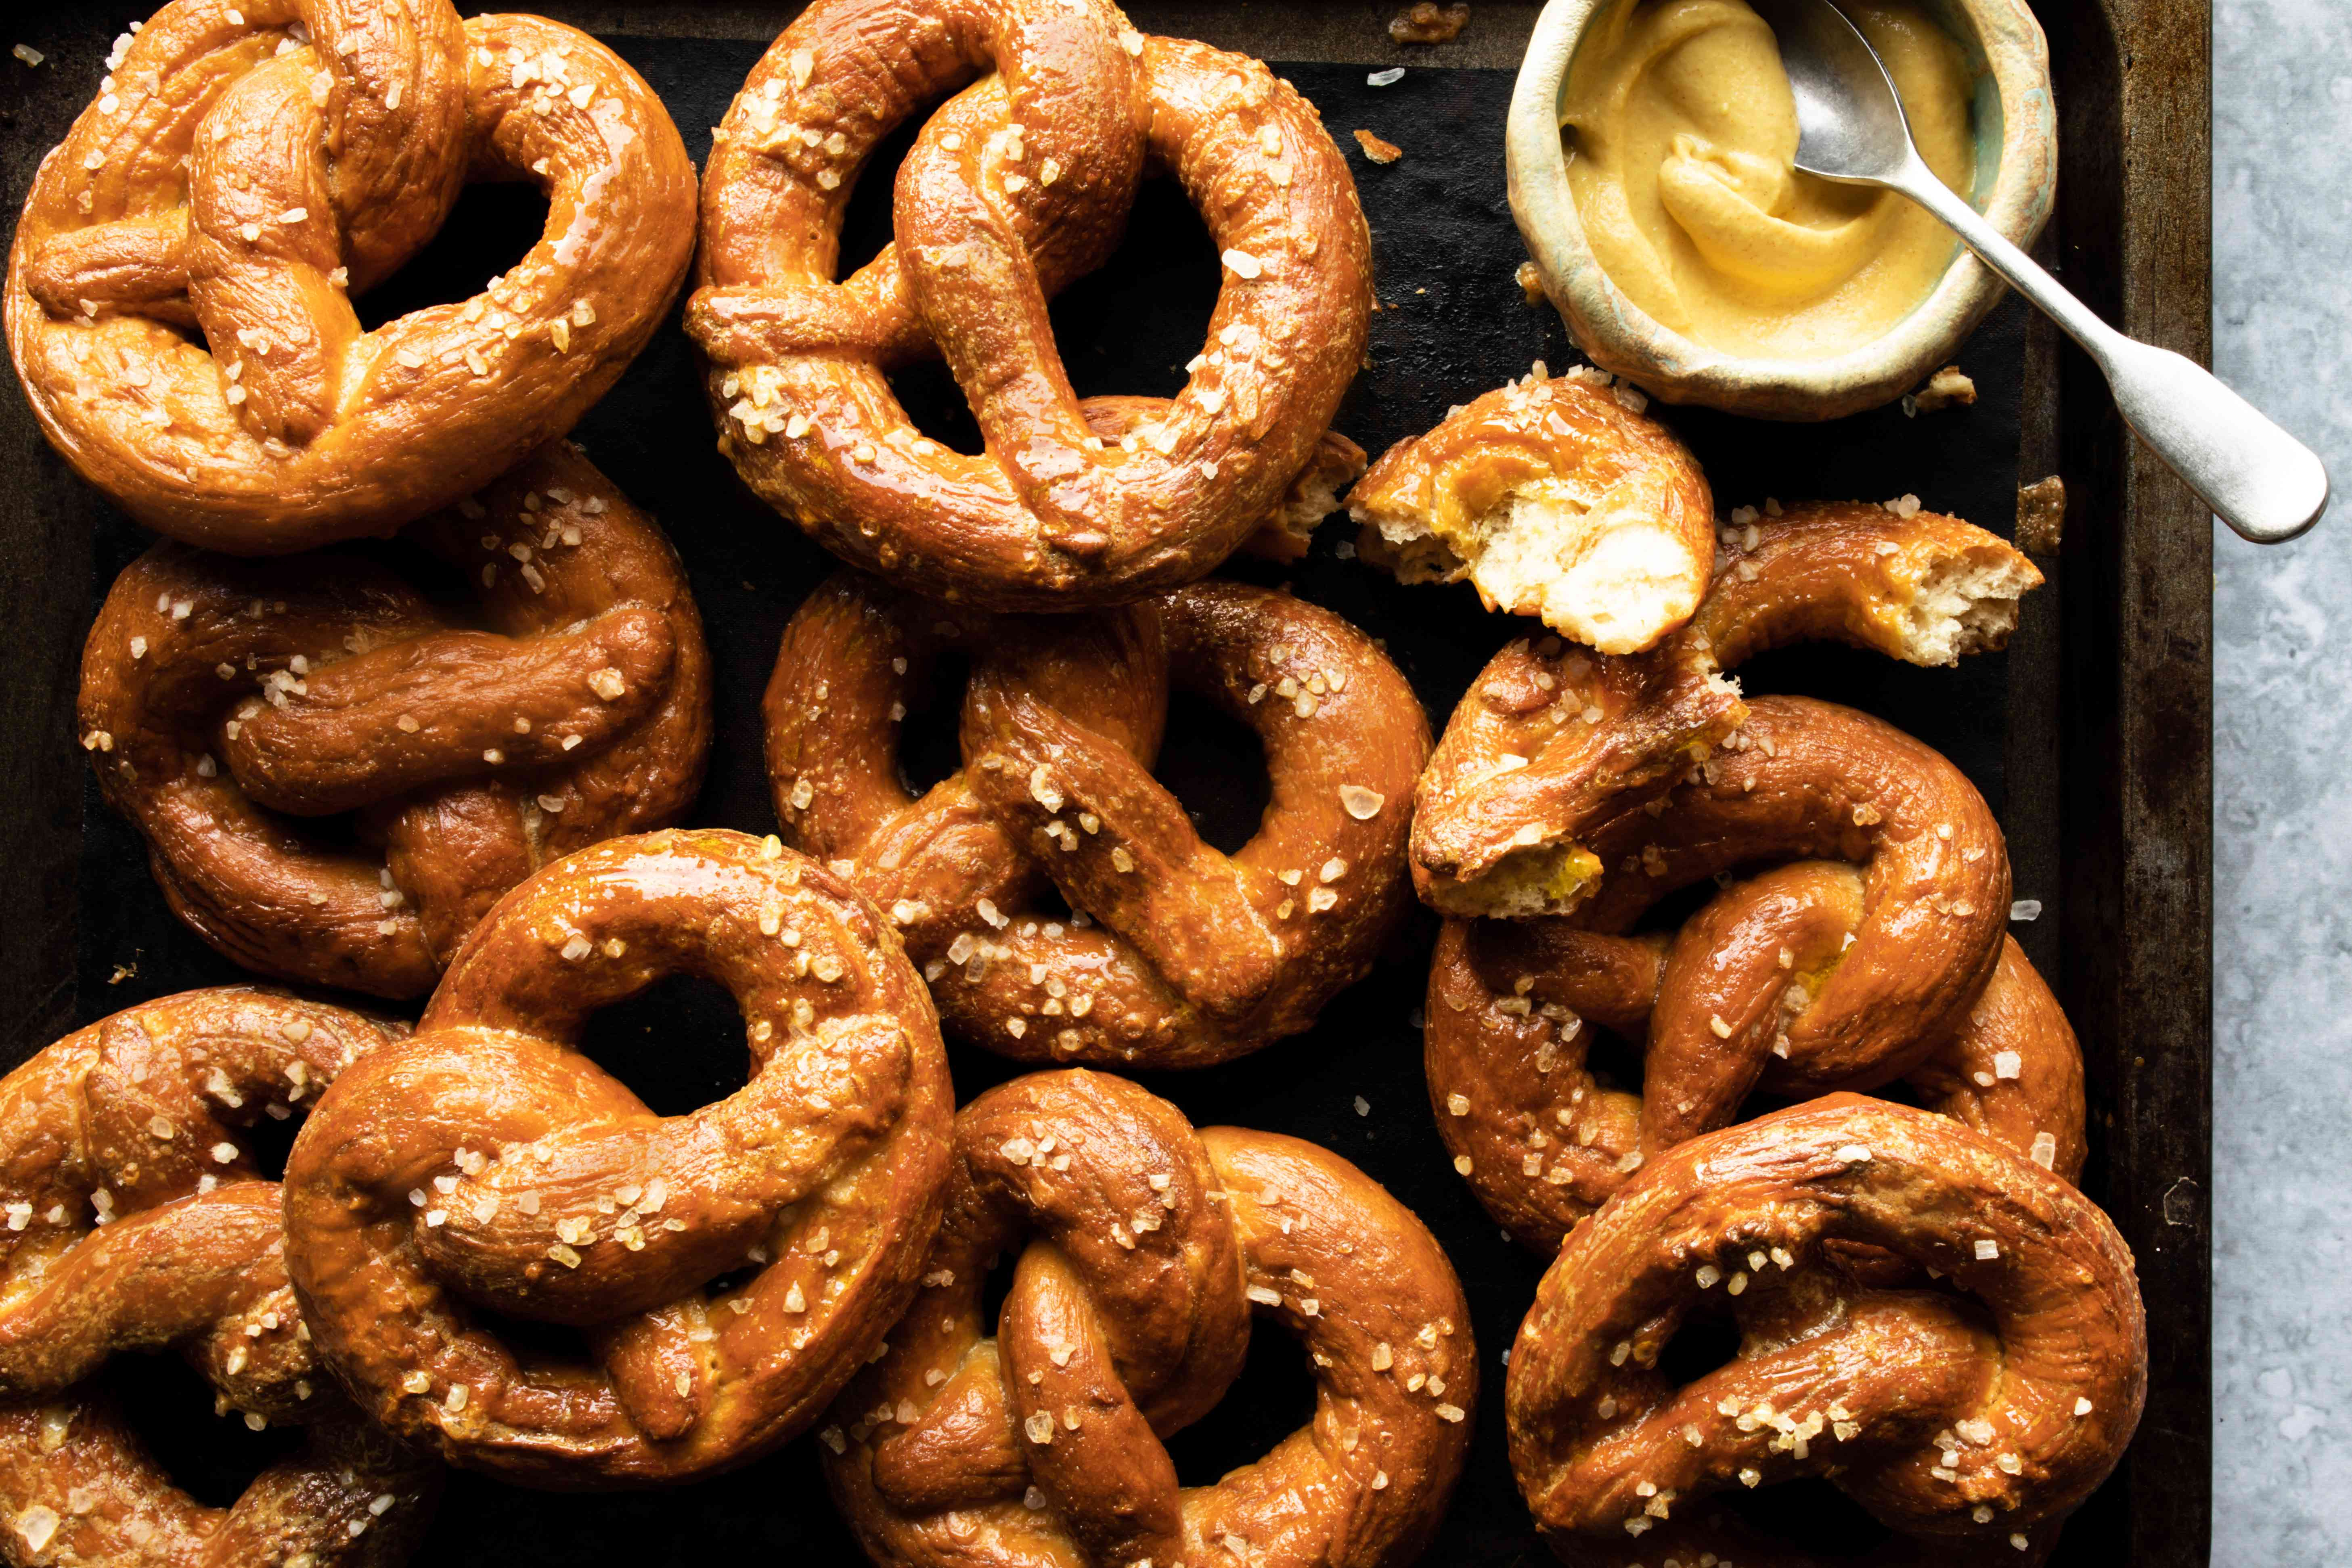 tray of homemade german pretzels